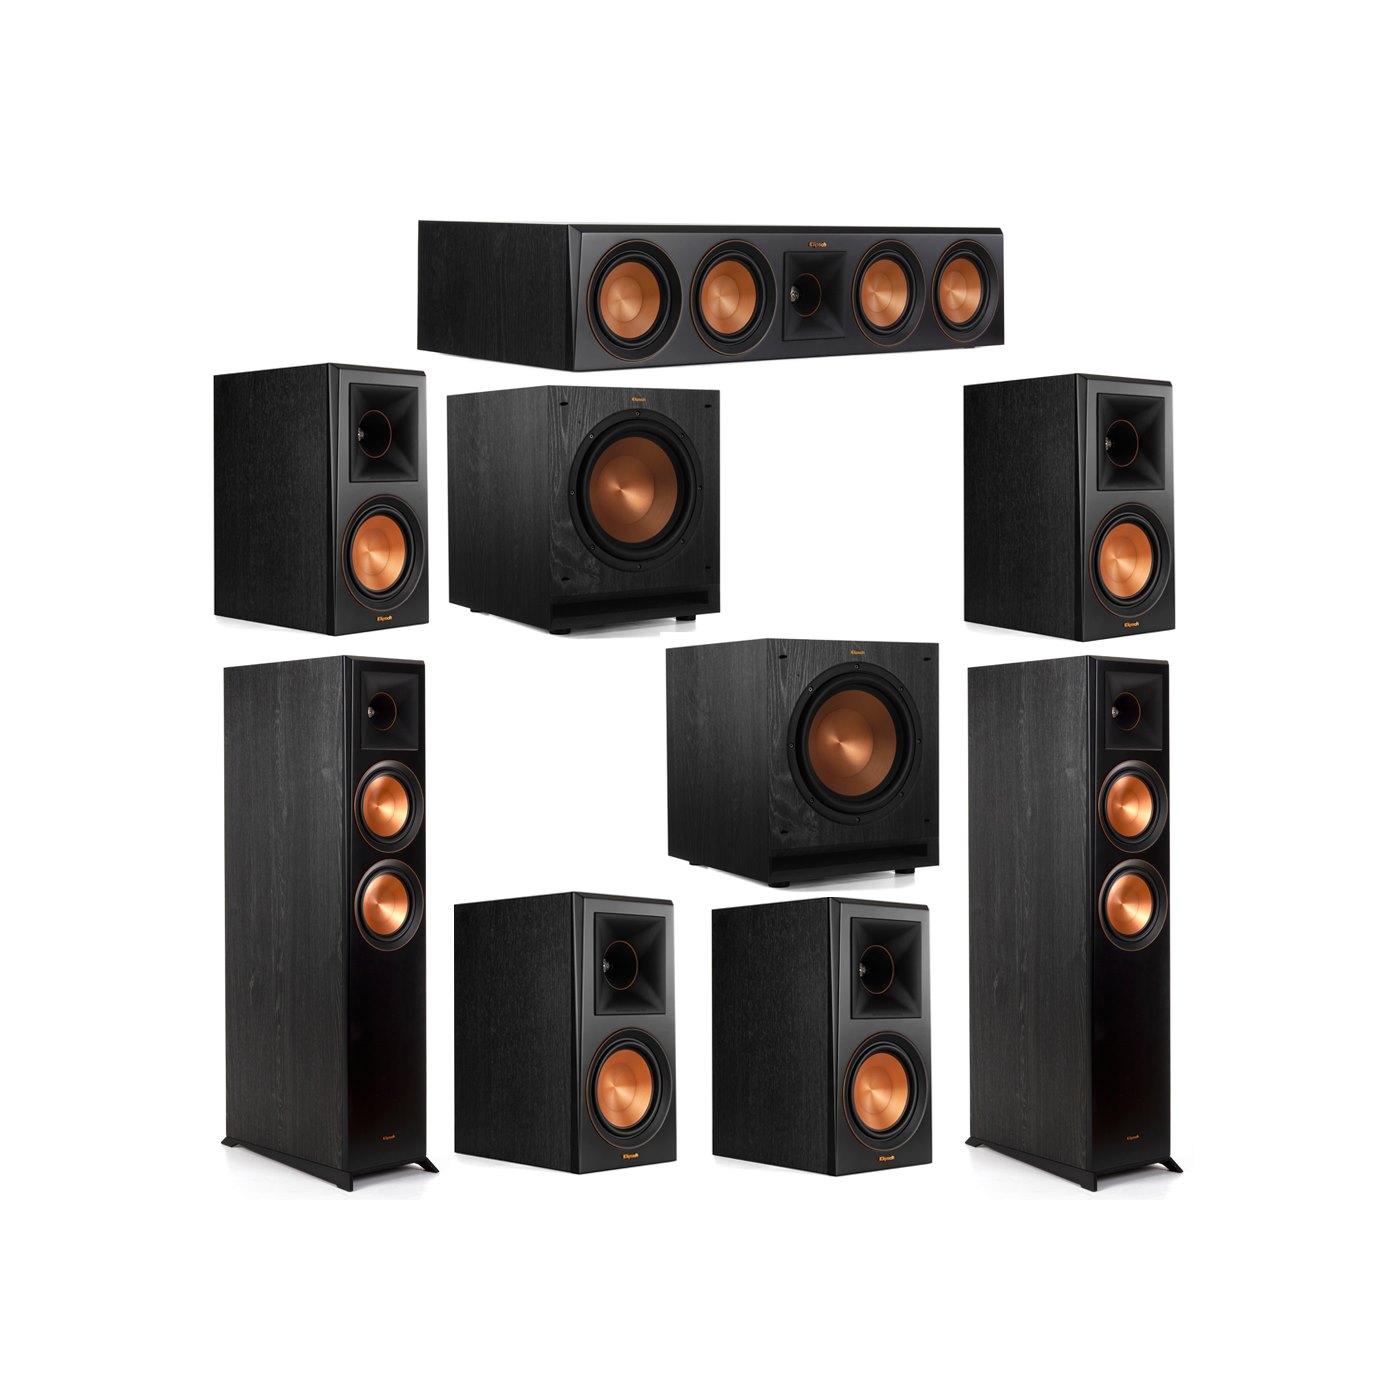 Klipsch 7.2 System with 2 RP-6000F Floorstanding Speakers, 1 Klipsch RP-504C Center Speaker, 4 Klipsch RP-600M Surround Speakers, 2 Klipsch SPL-100 Subwoofers